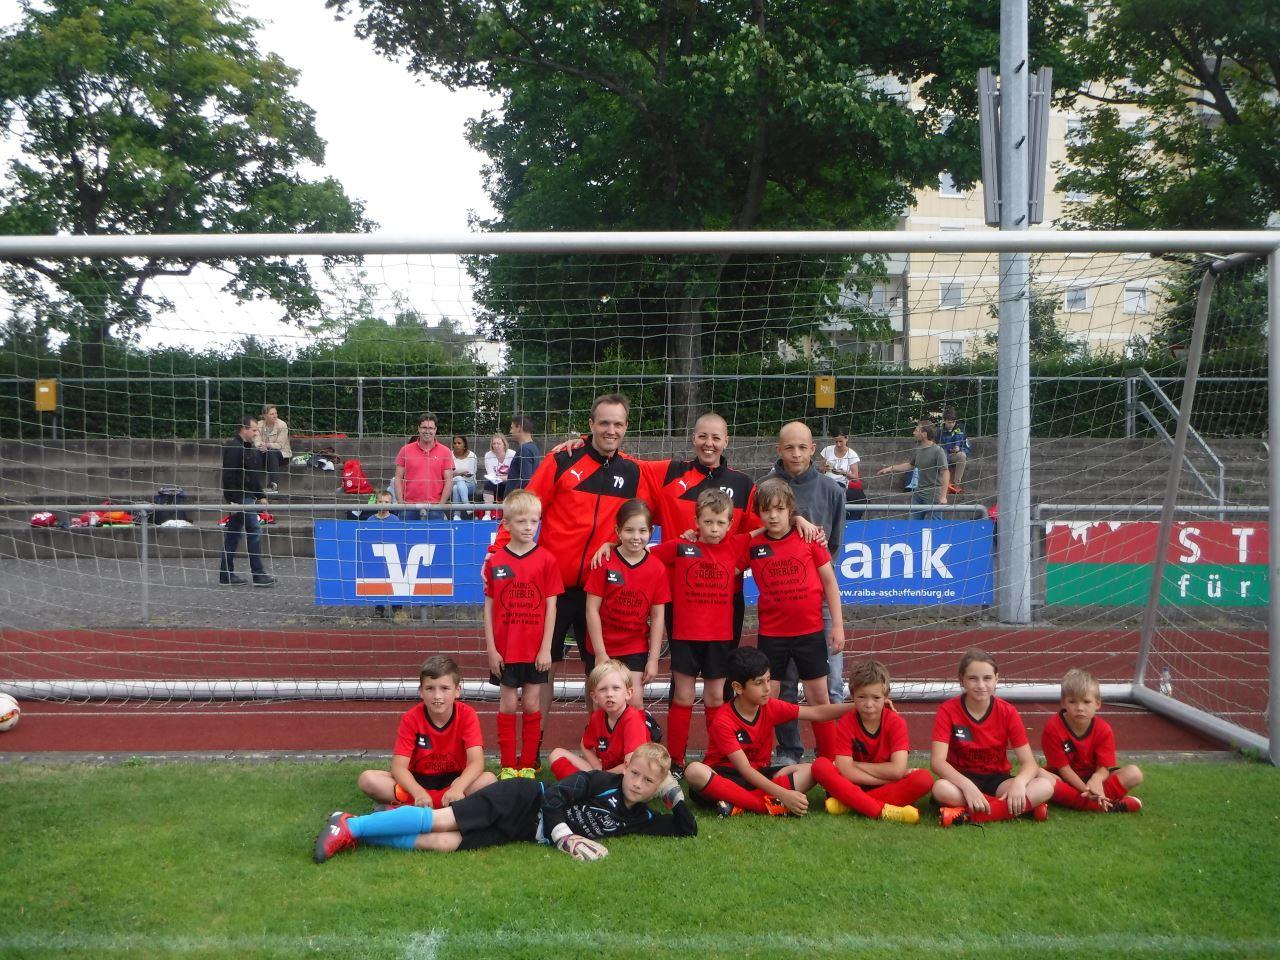 F2-Jugend des TV Schweinheim bei Junioren Stadtmeisterschaft 2017